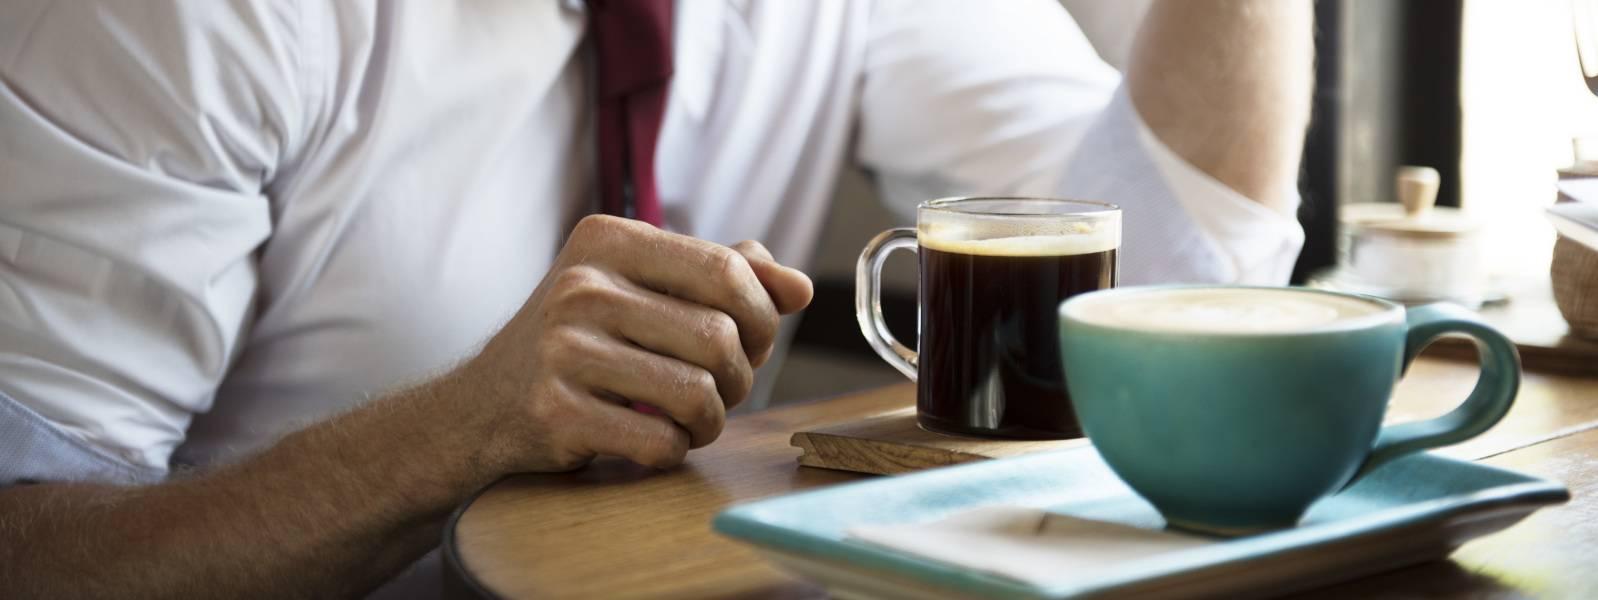 businessman drinking coffee mug high amounts of caffeine exacerbate sleep deprivation